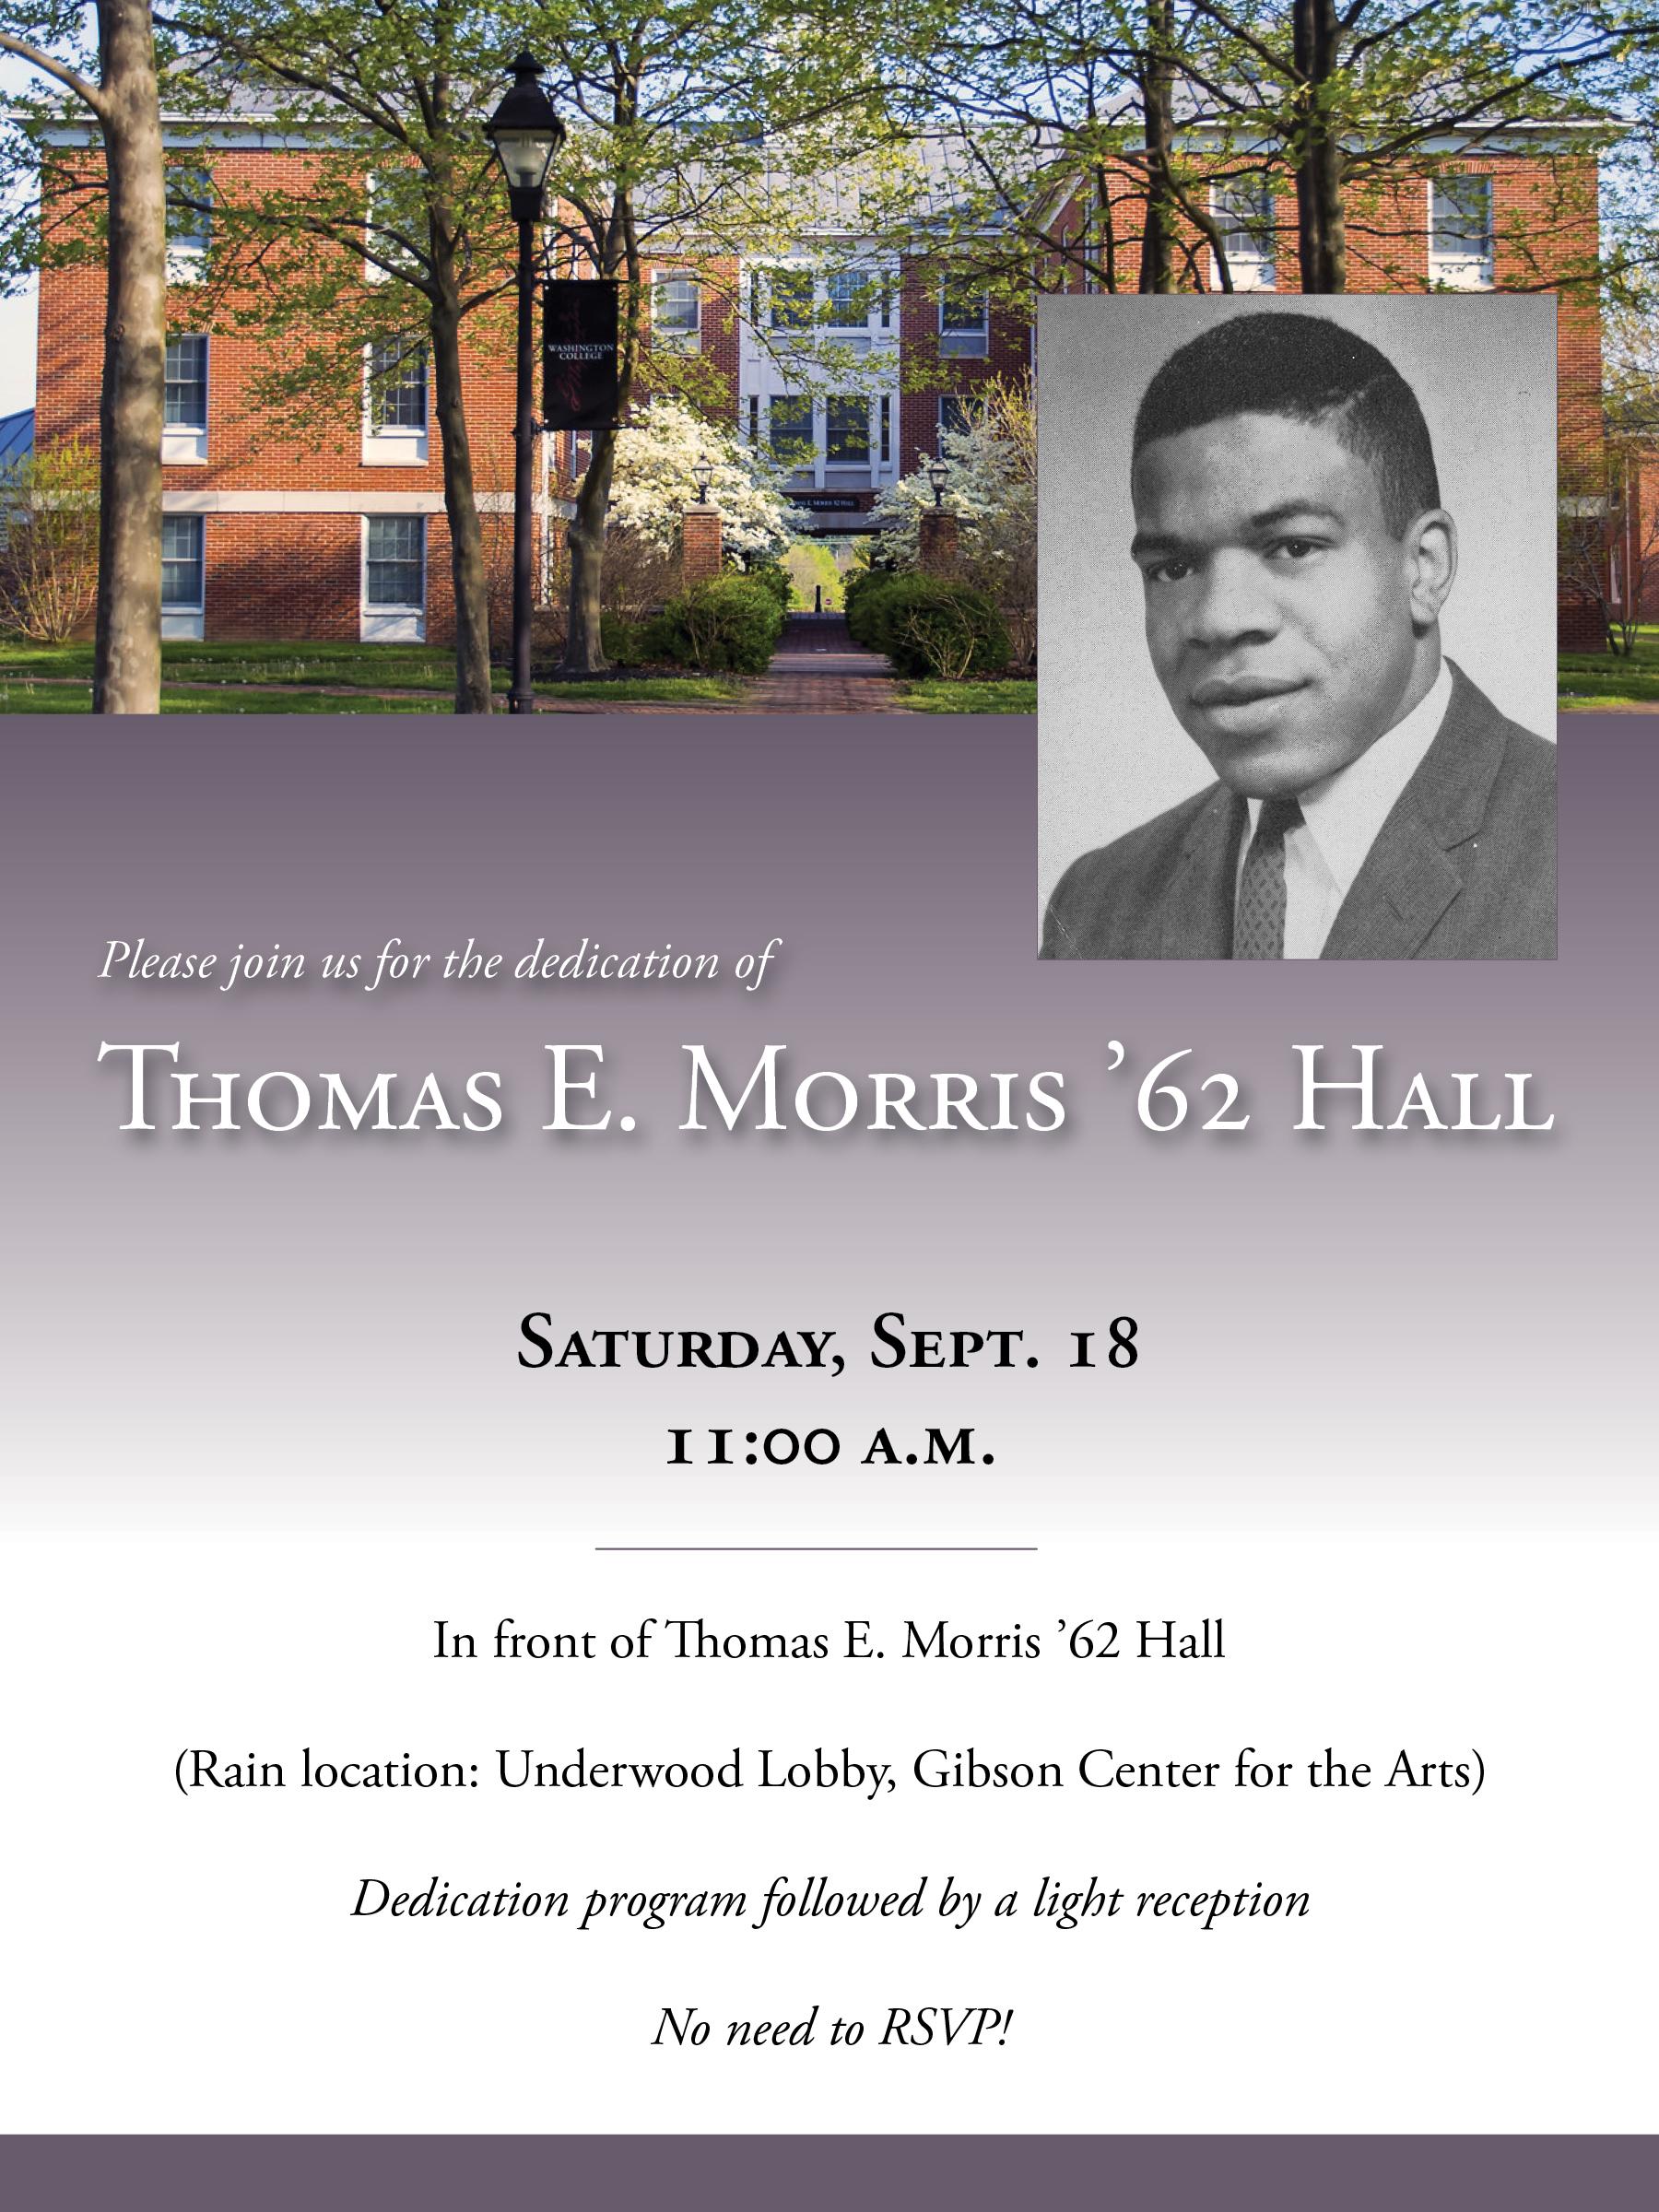 The Dedication of Thomas E. Morris '62 Hall